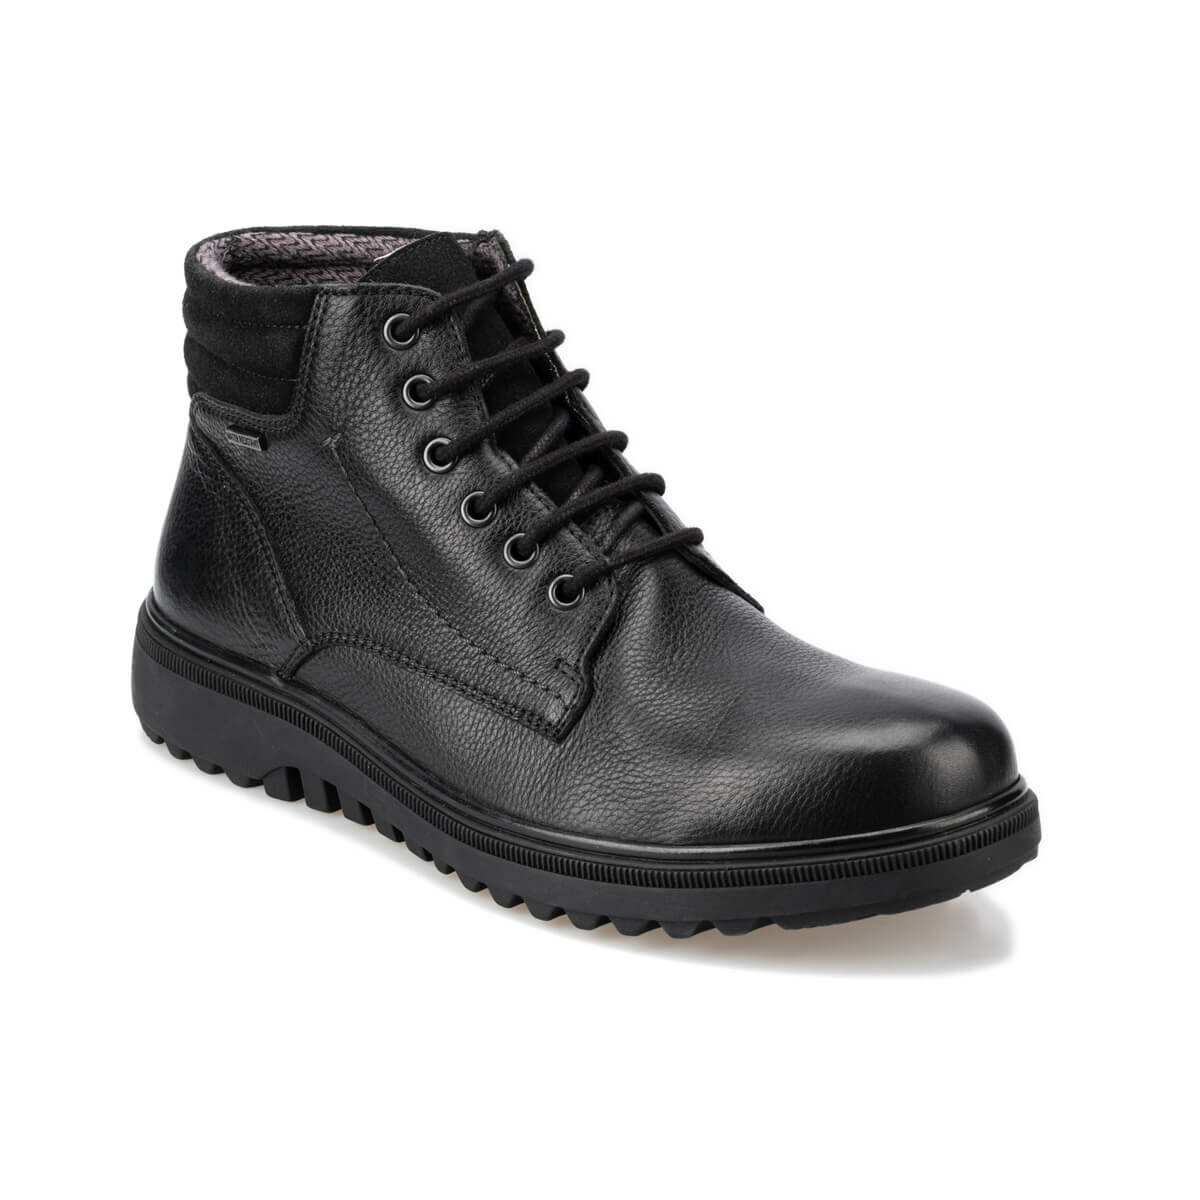 FLO 92.100947.M Black Men Boots Polaris 5 Point